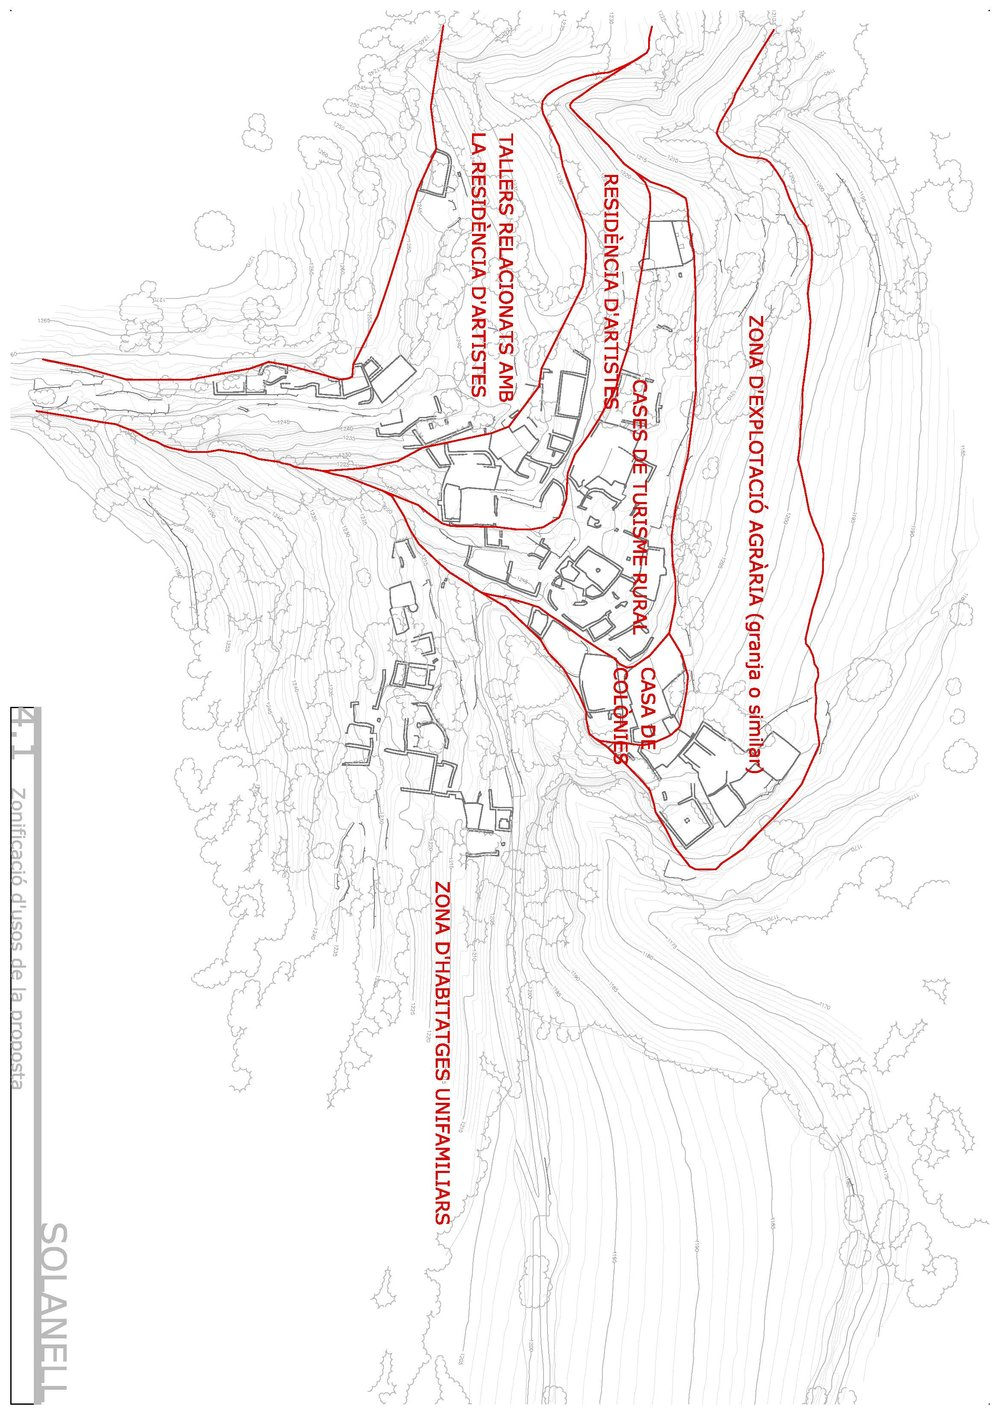 04 PROPOSTA 4-00 (1).jpg